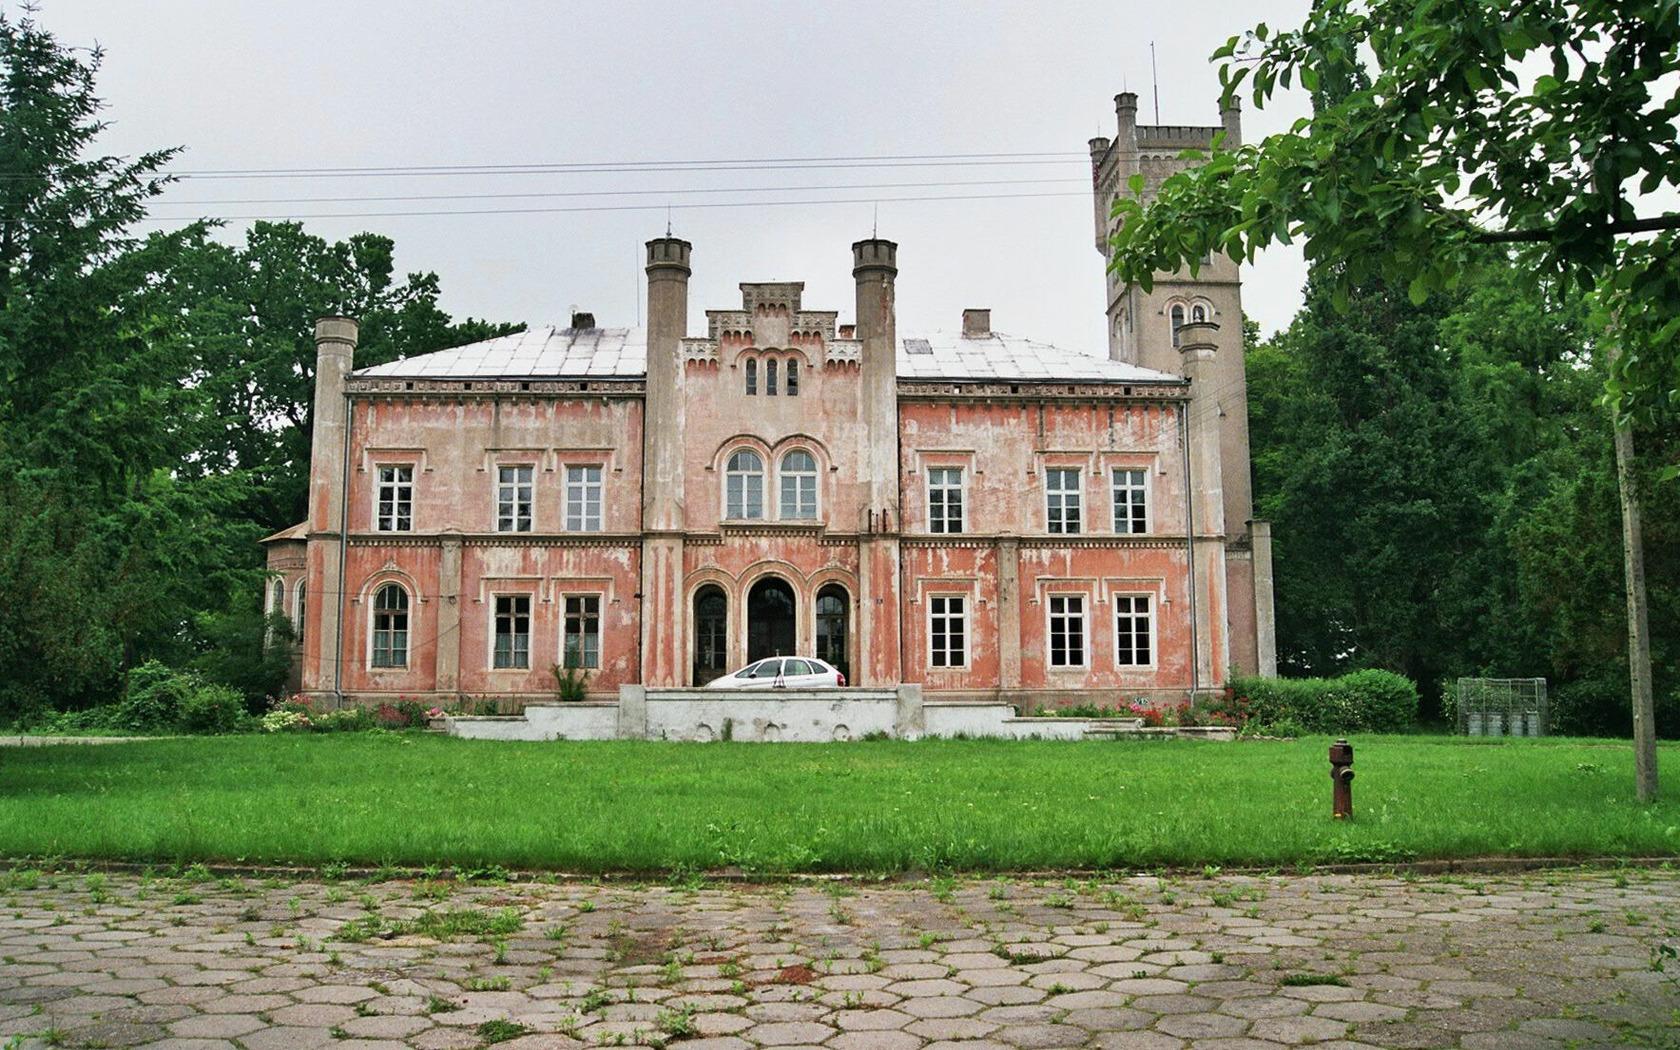 Schloss im englischen Stil, Foto: MuT Guben e.V.